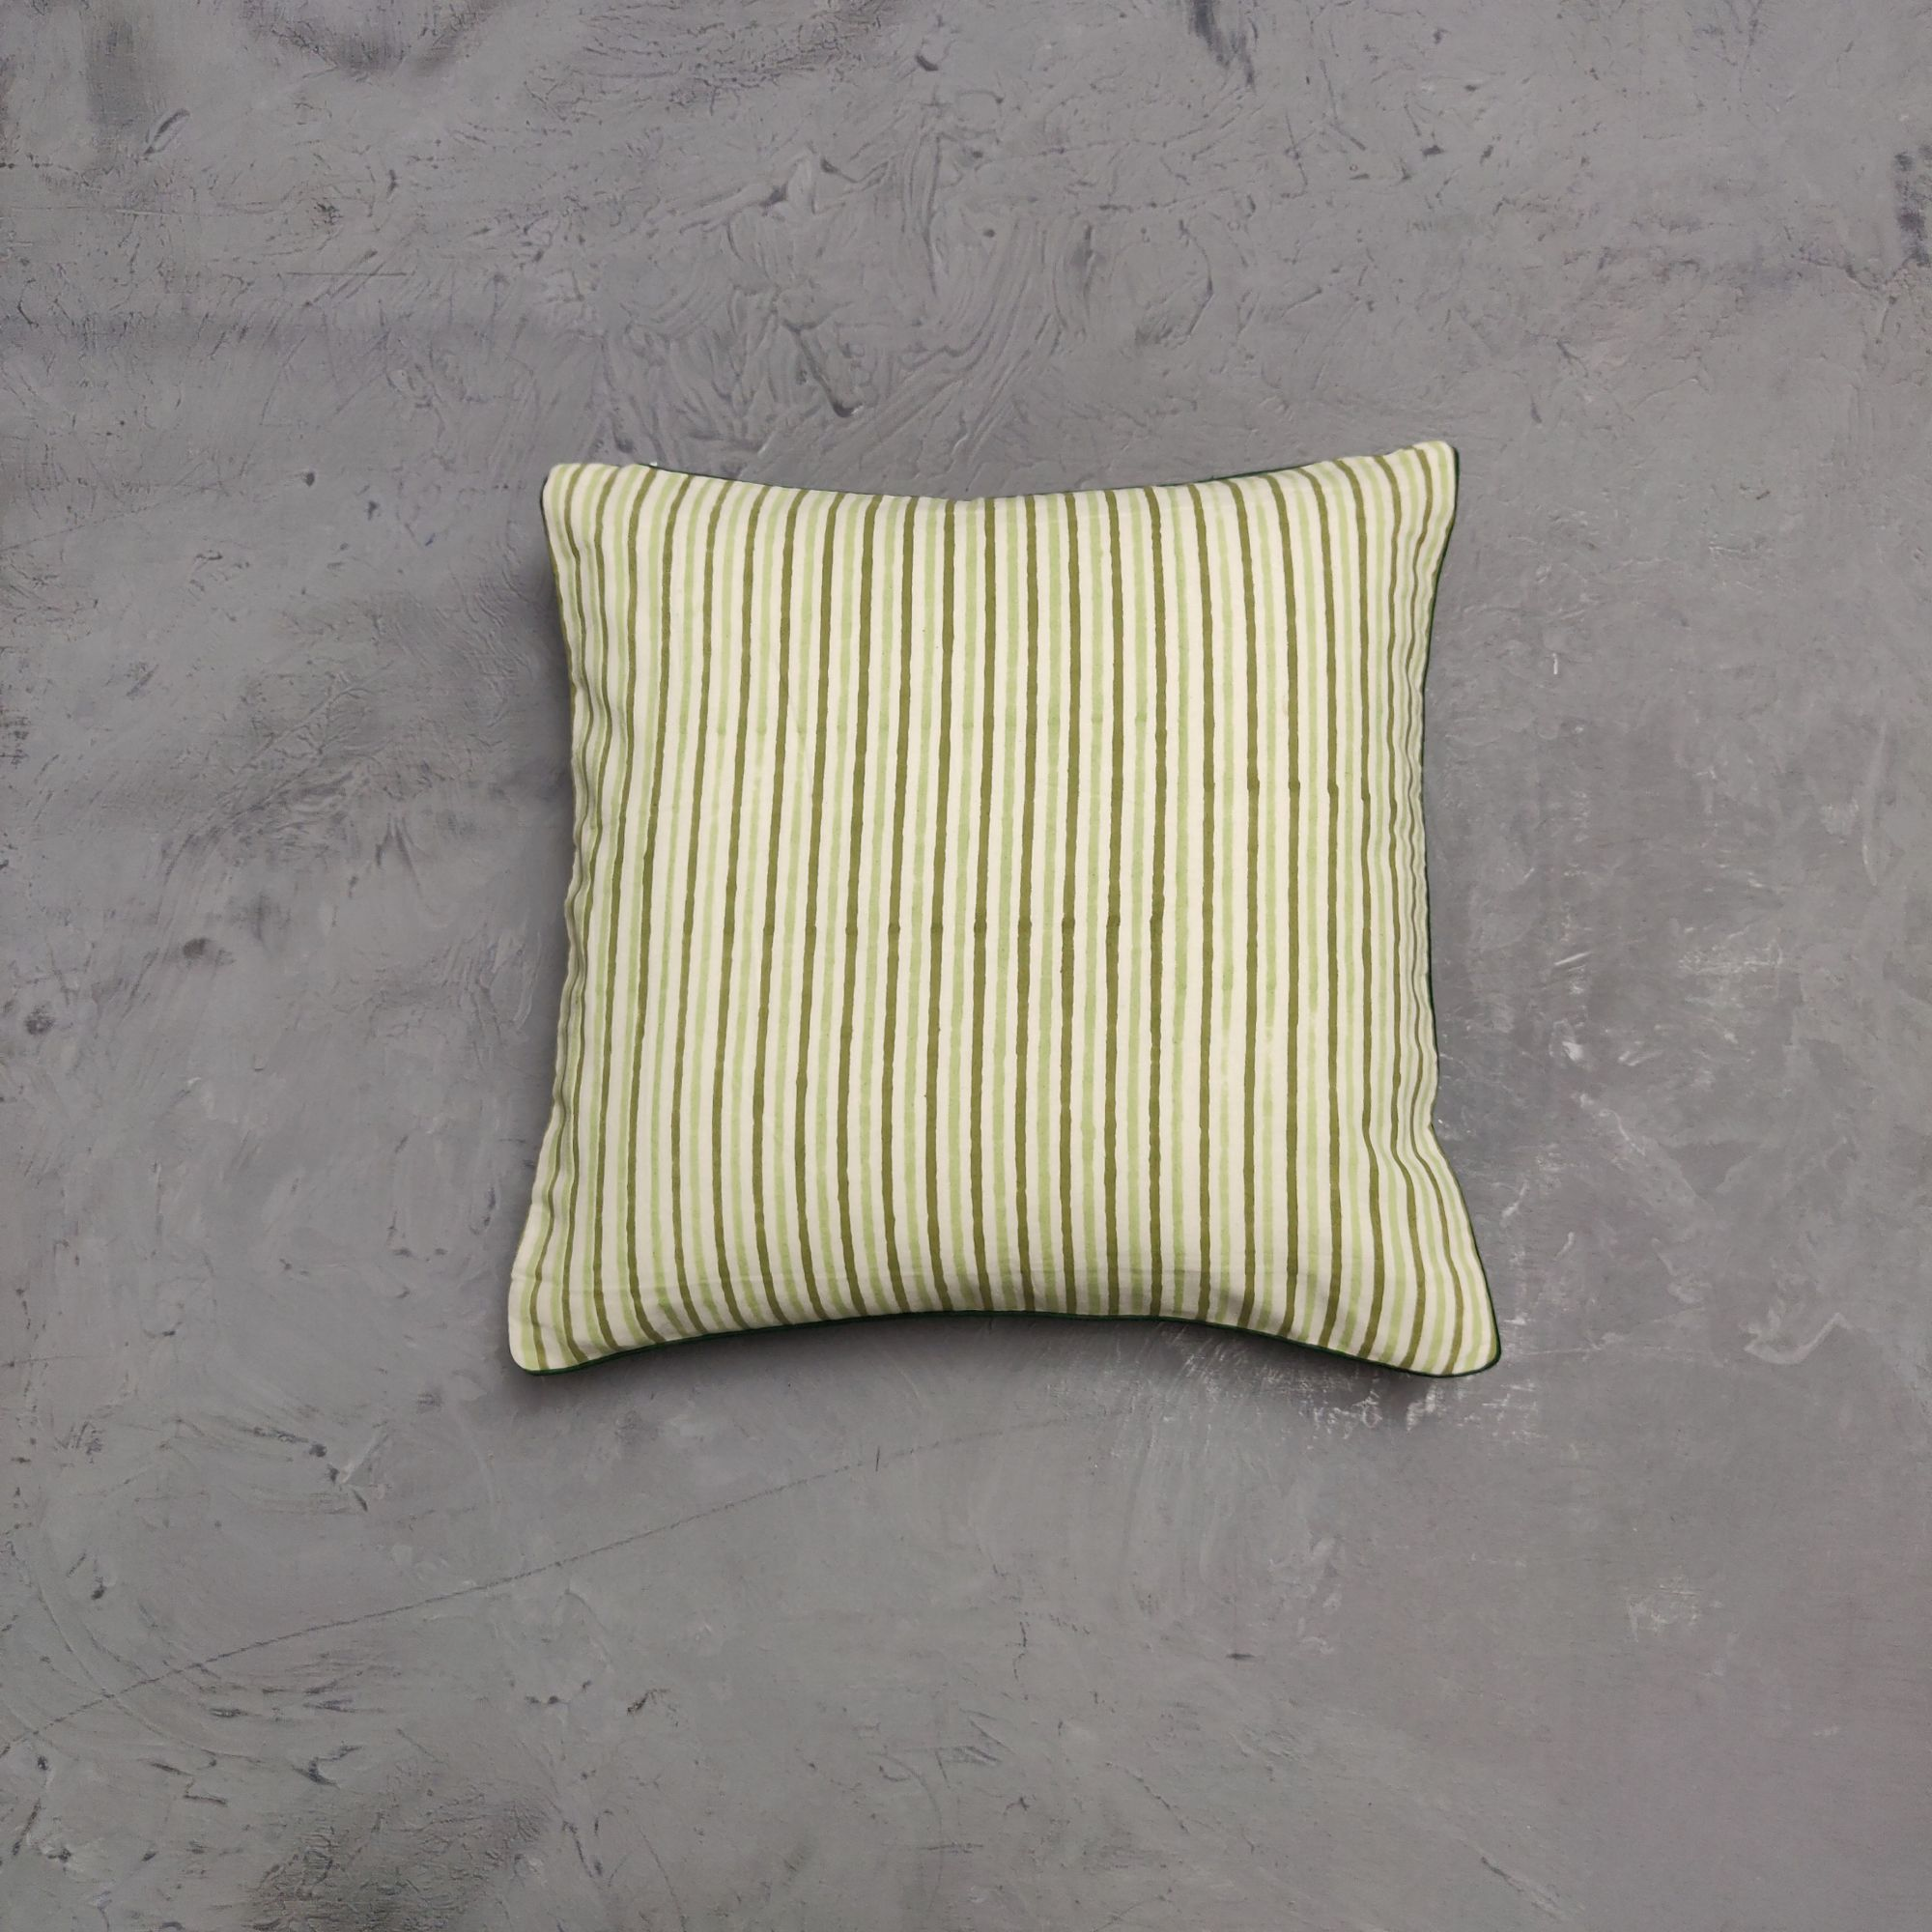 Reversible Handblock Printed Cushion Cover 12X12 C37